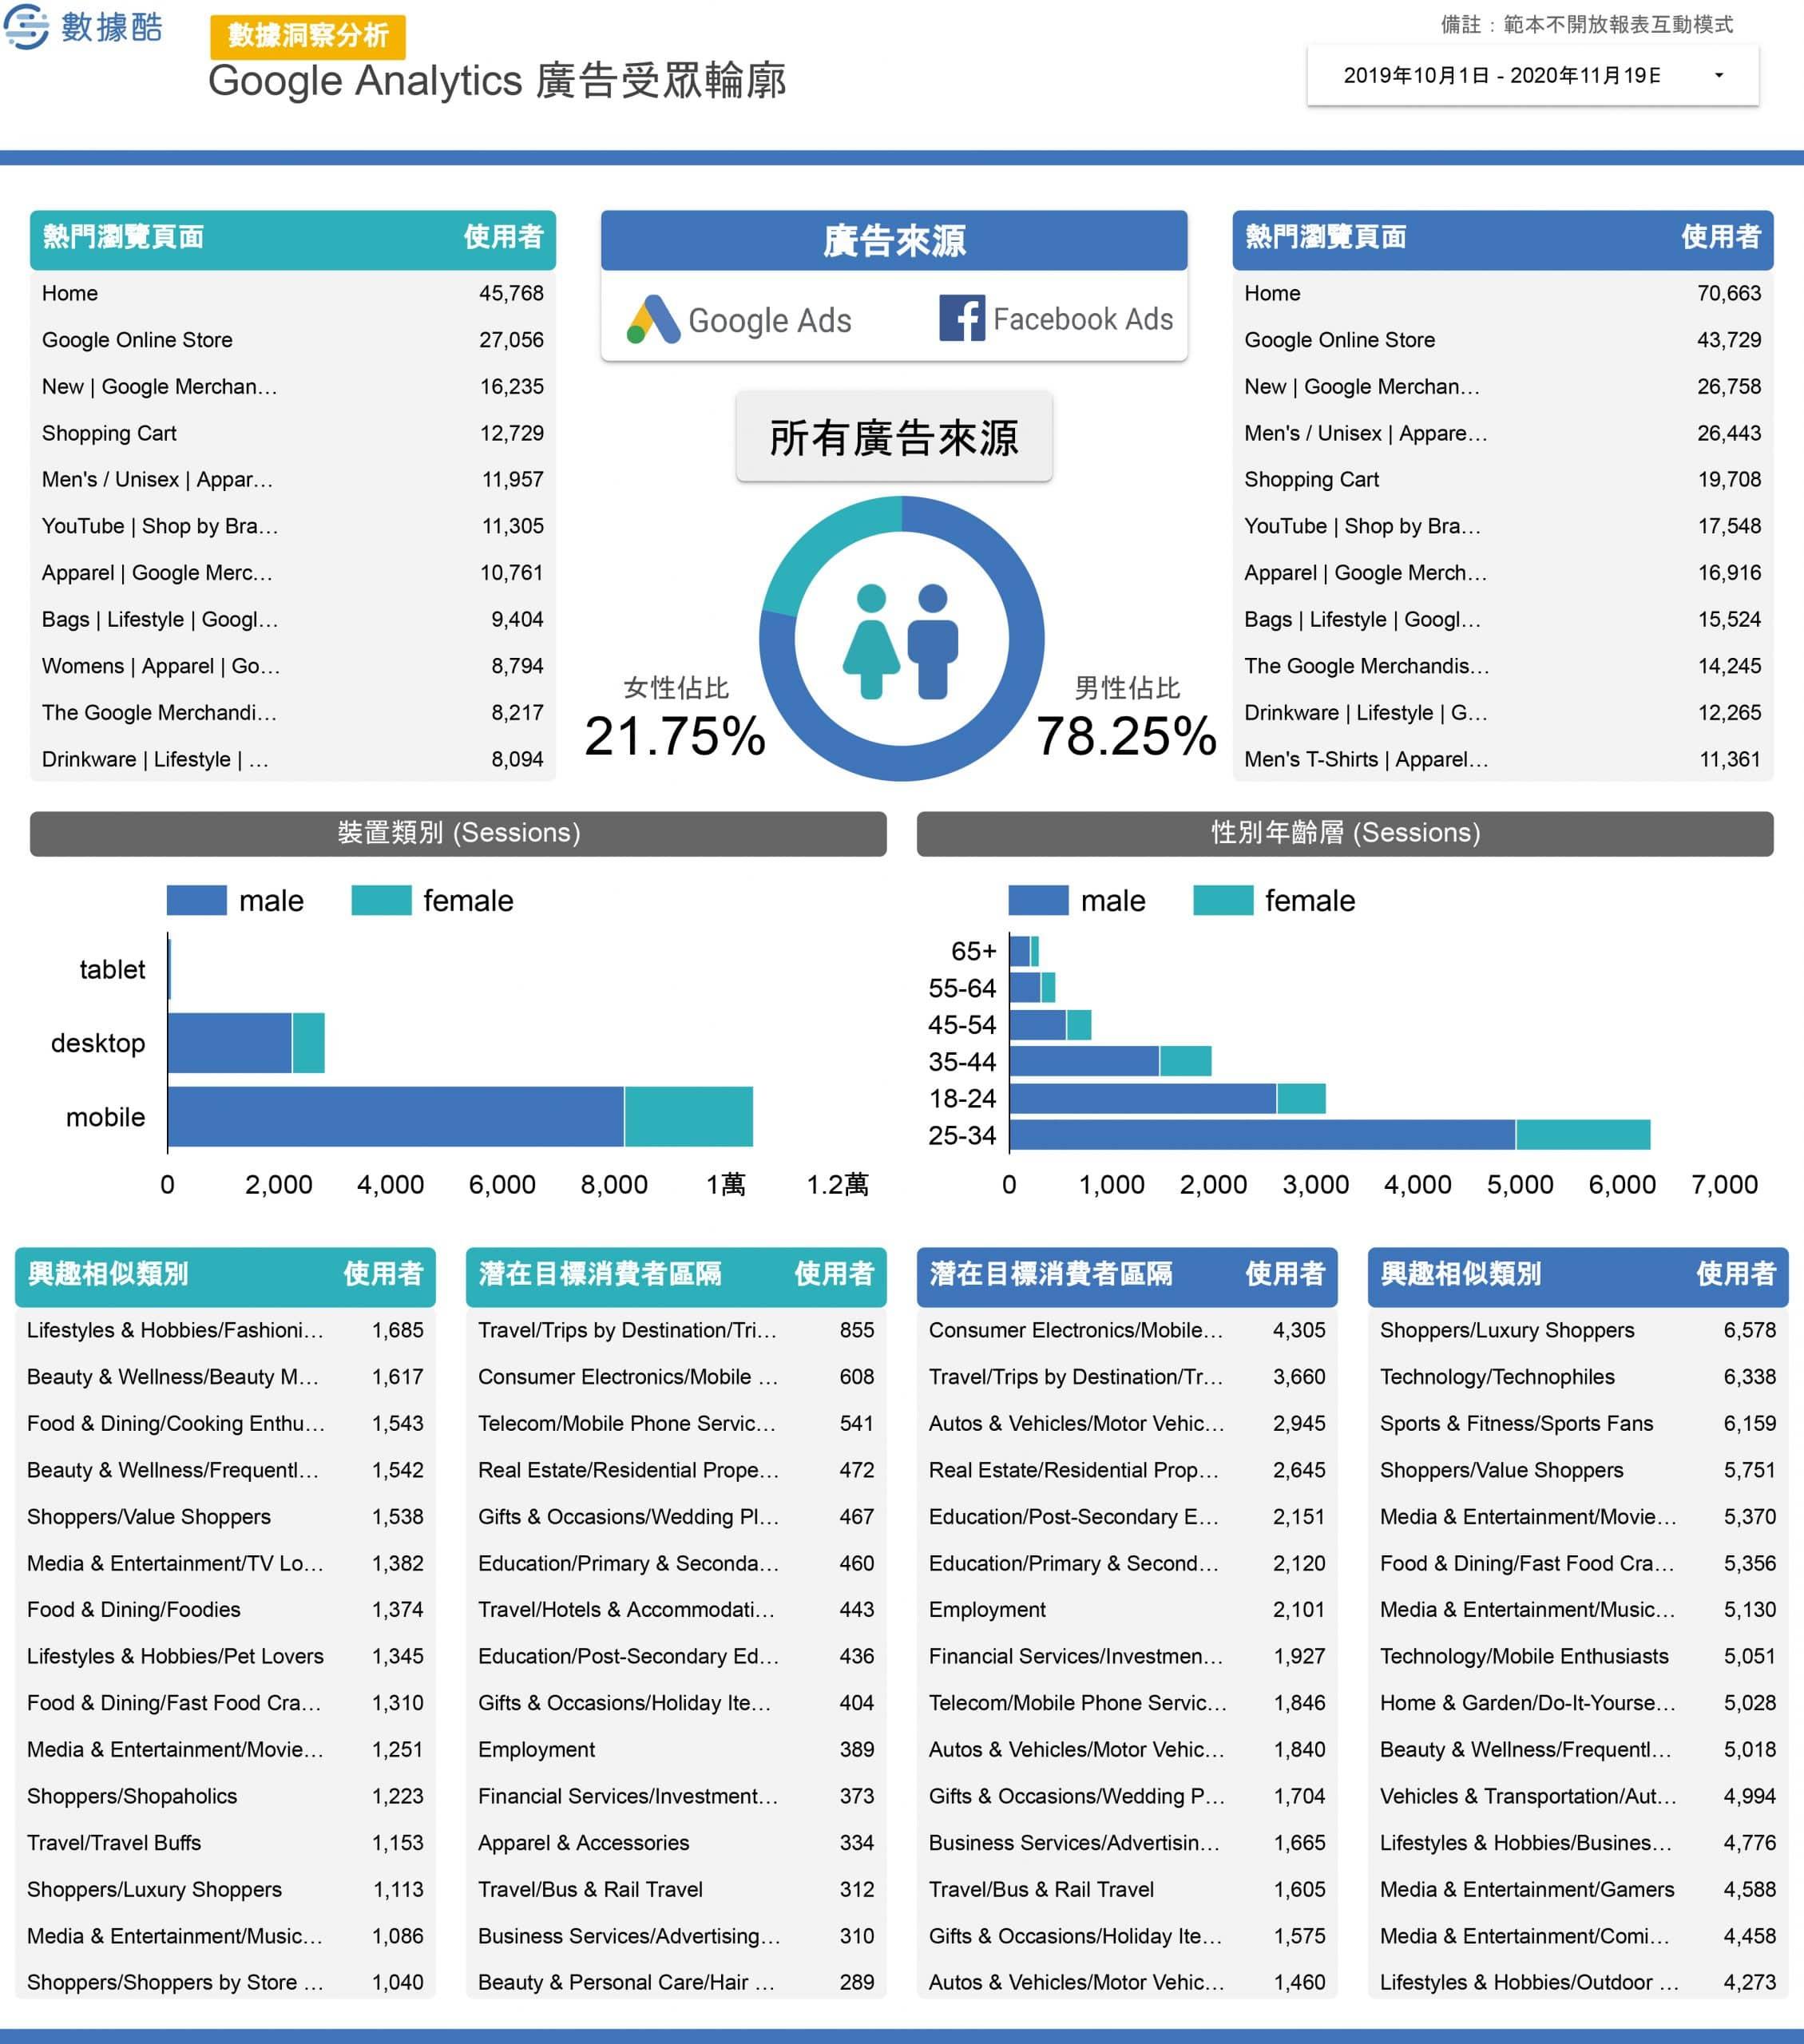 Google_Analytics_常用報表-2